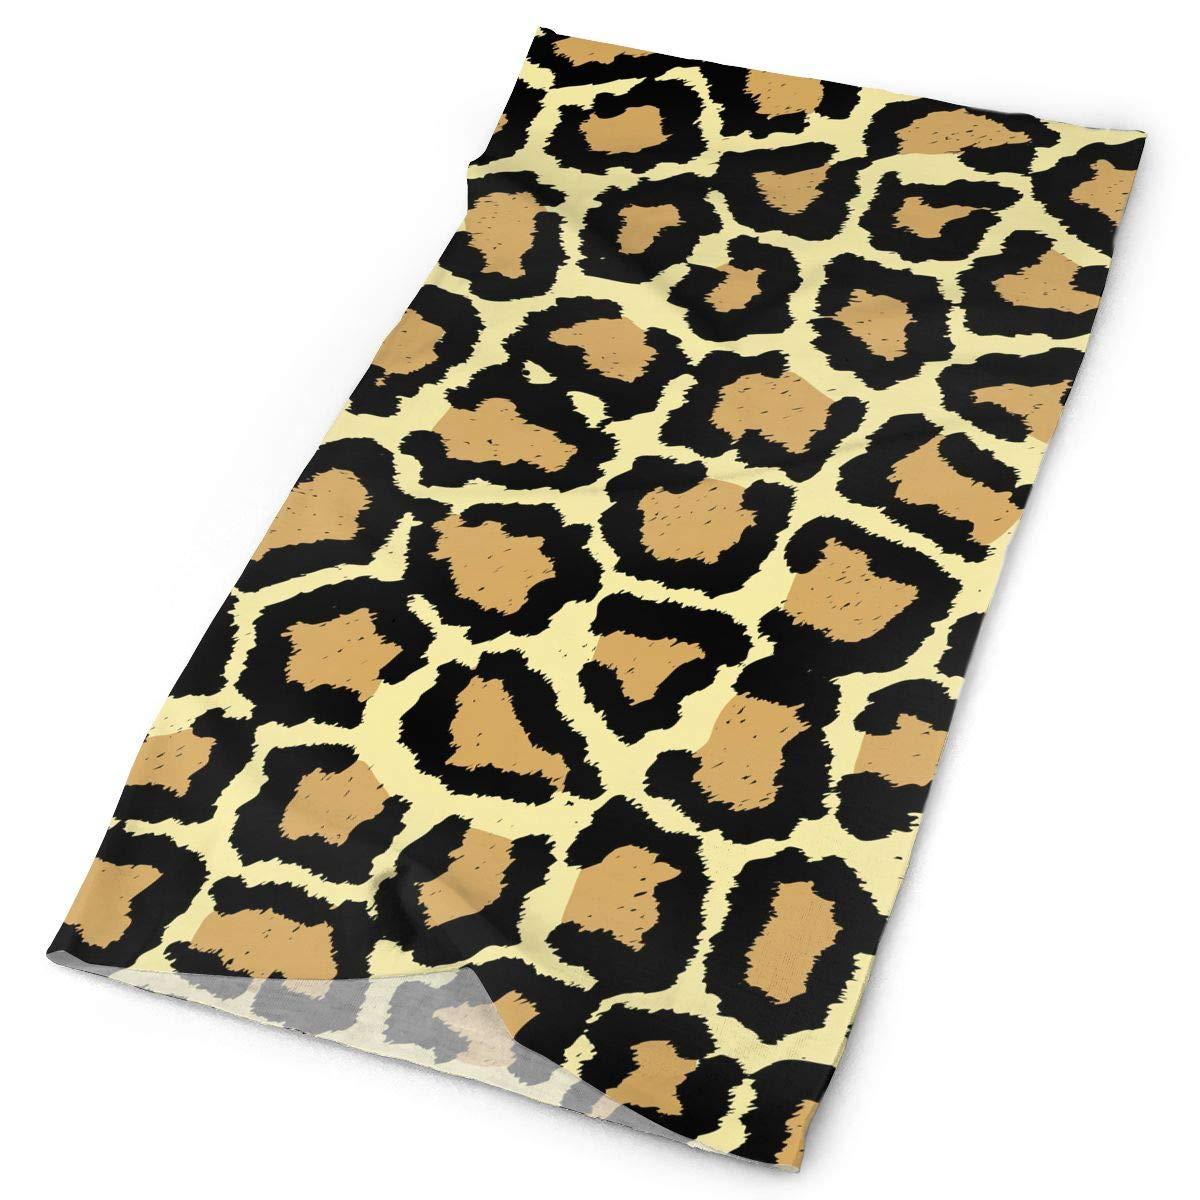 Owen Pullman Multifunctional Headwear Giraffe Print Yellow Head Wrap Elastic Turban Sport Headband Outdoor Sweatband